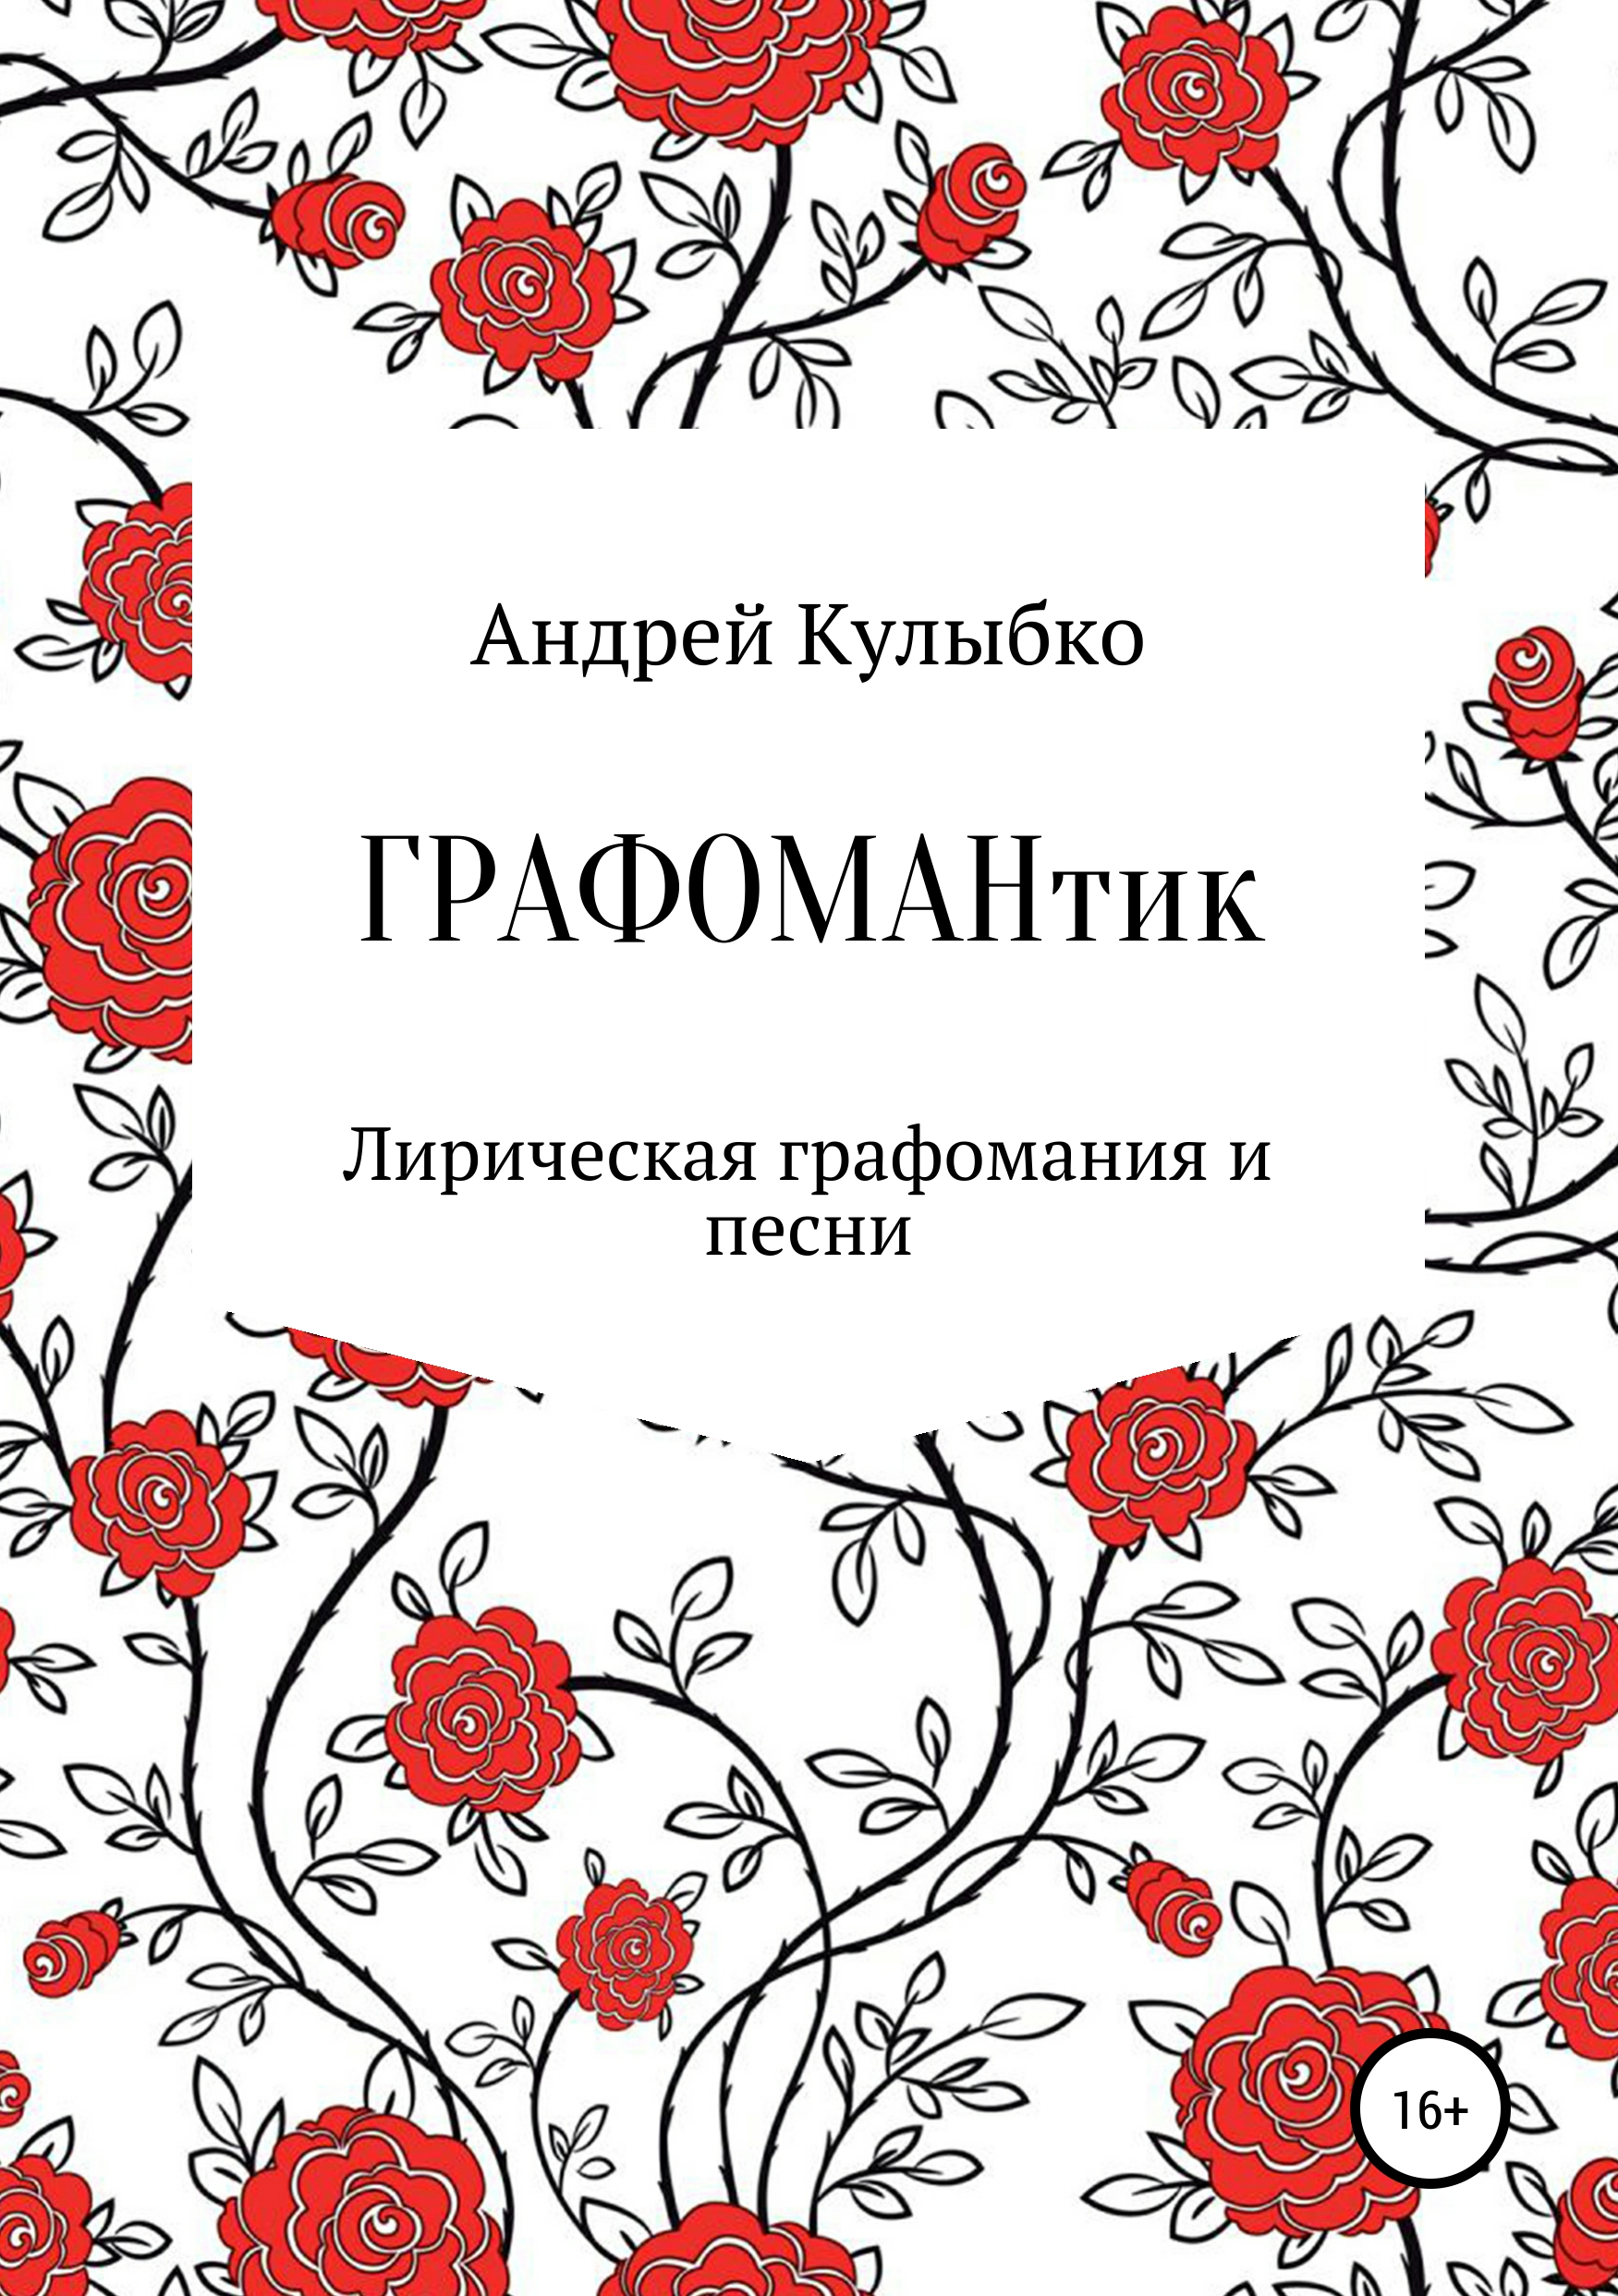 Андрей Александрович Кулыбко Графомантик евгения шагурова 10 красивых историй о любви